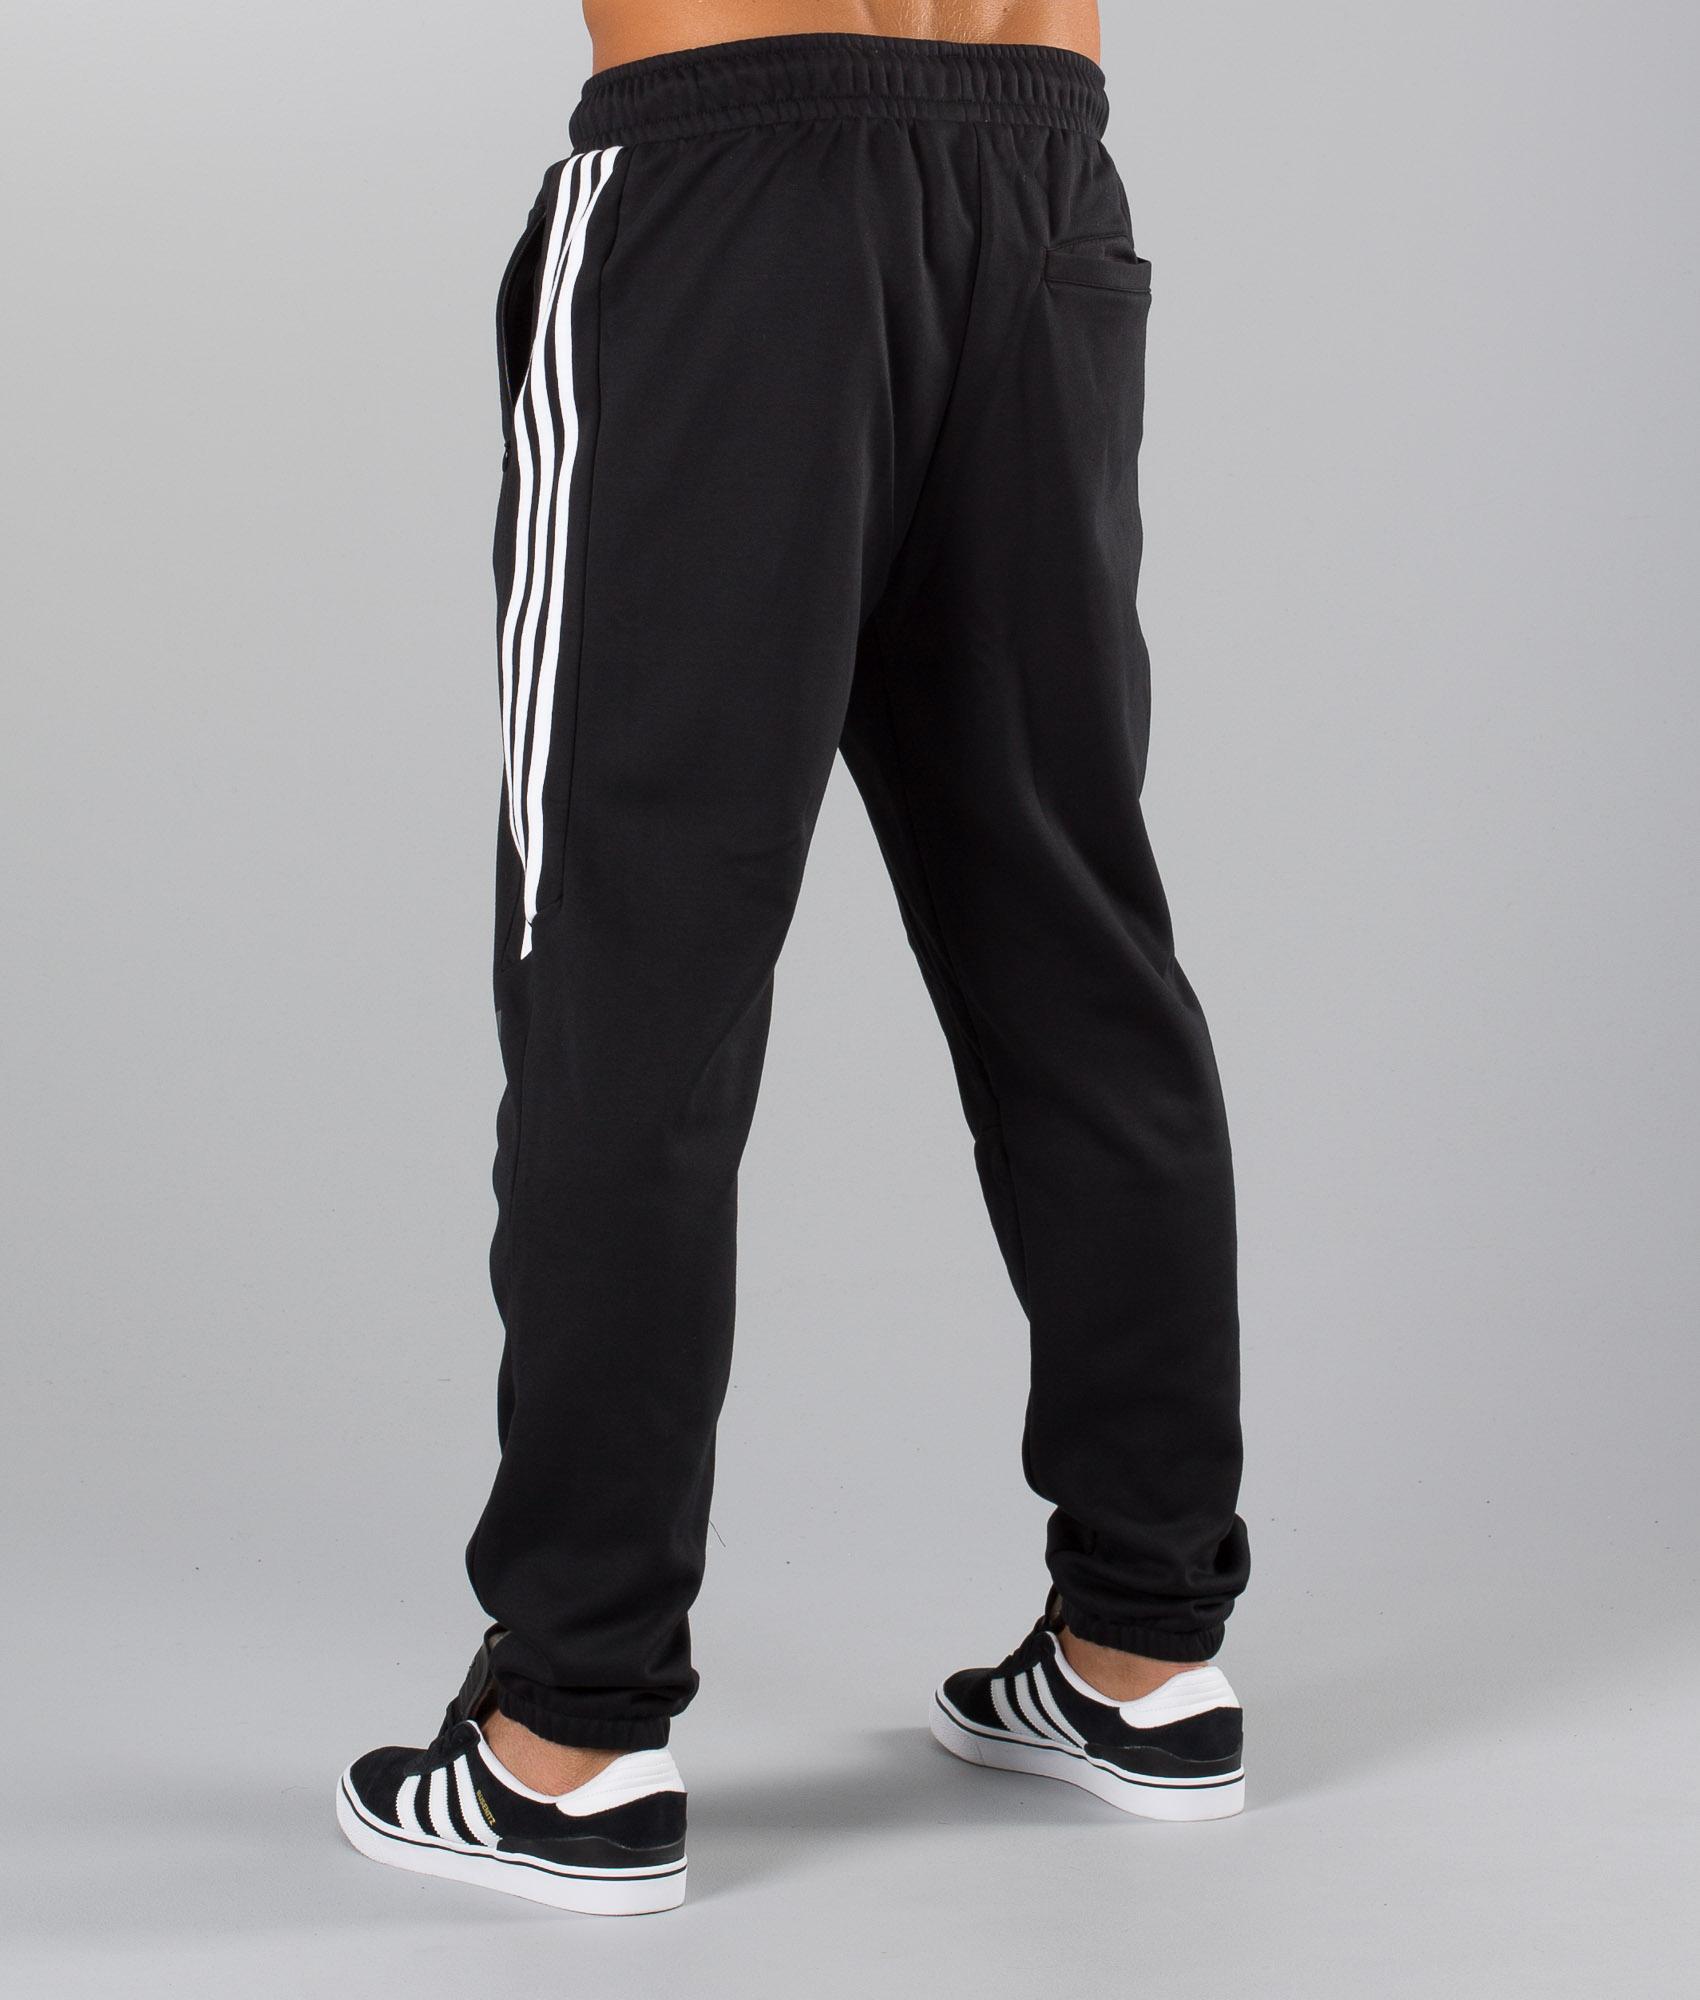 adidas Herren Hose Ess Sweat Pant Black, S: